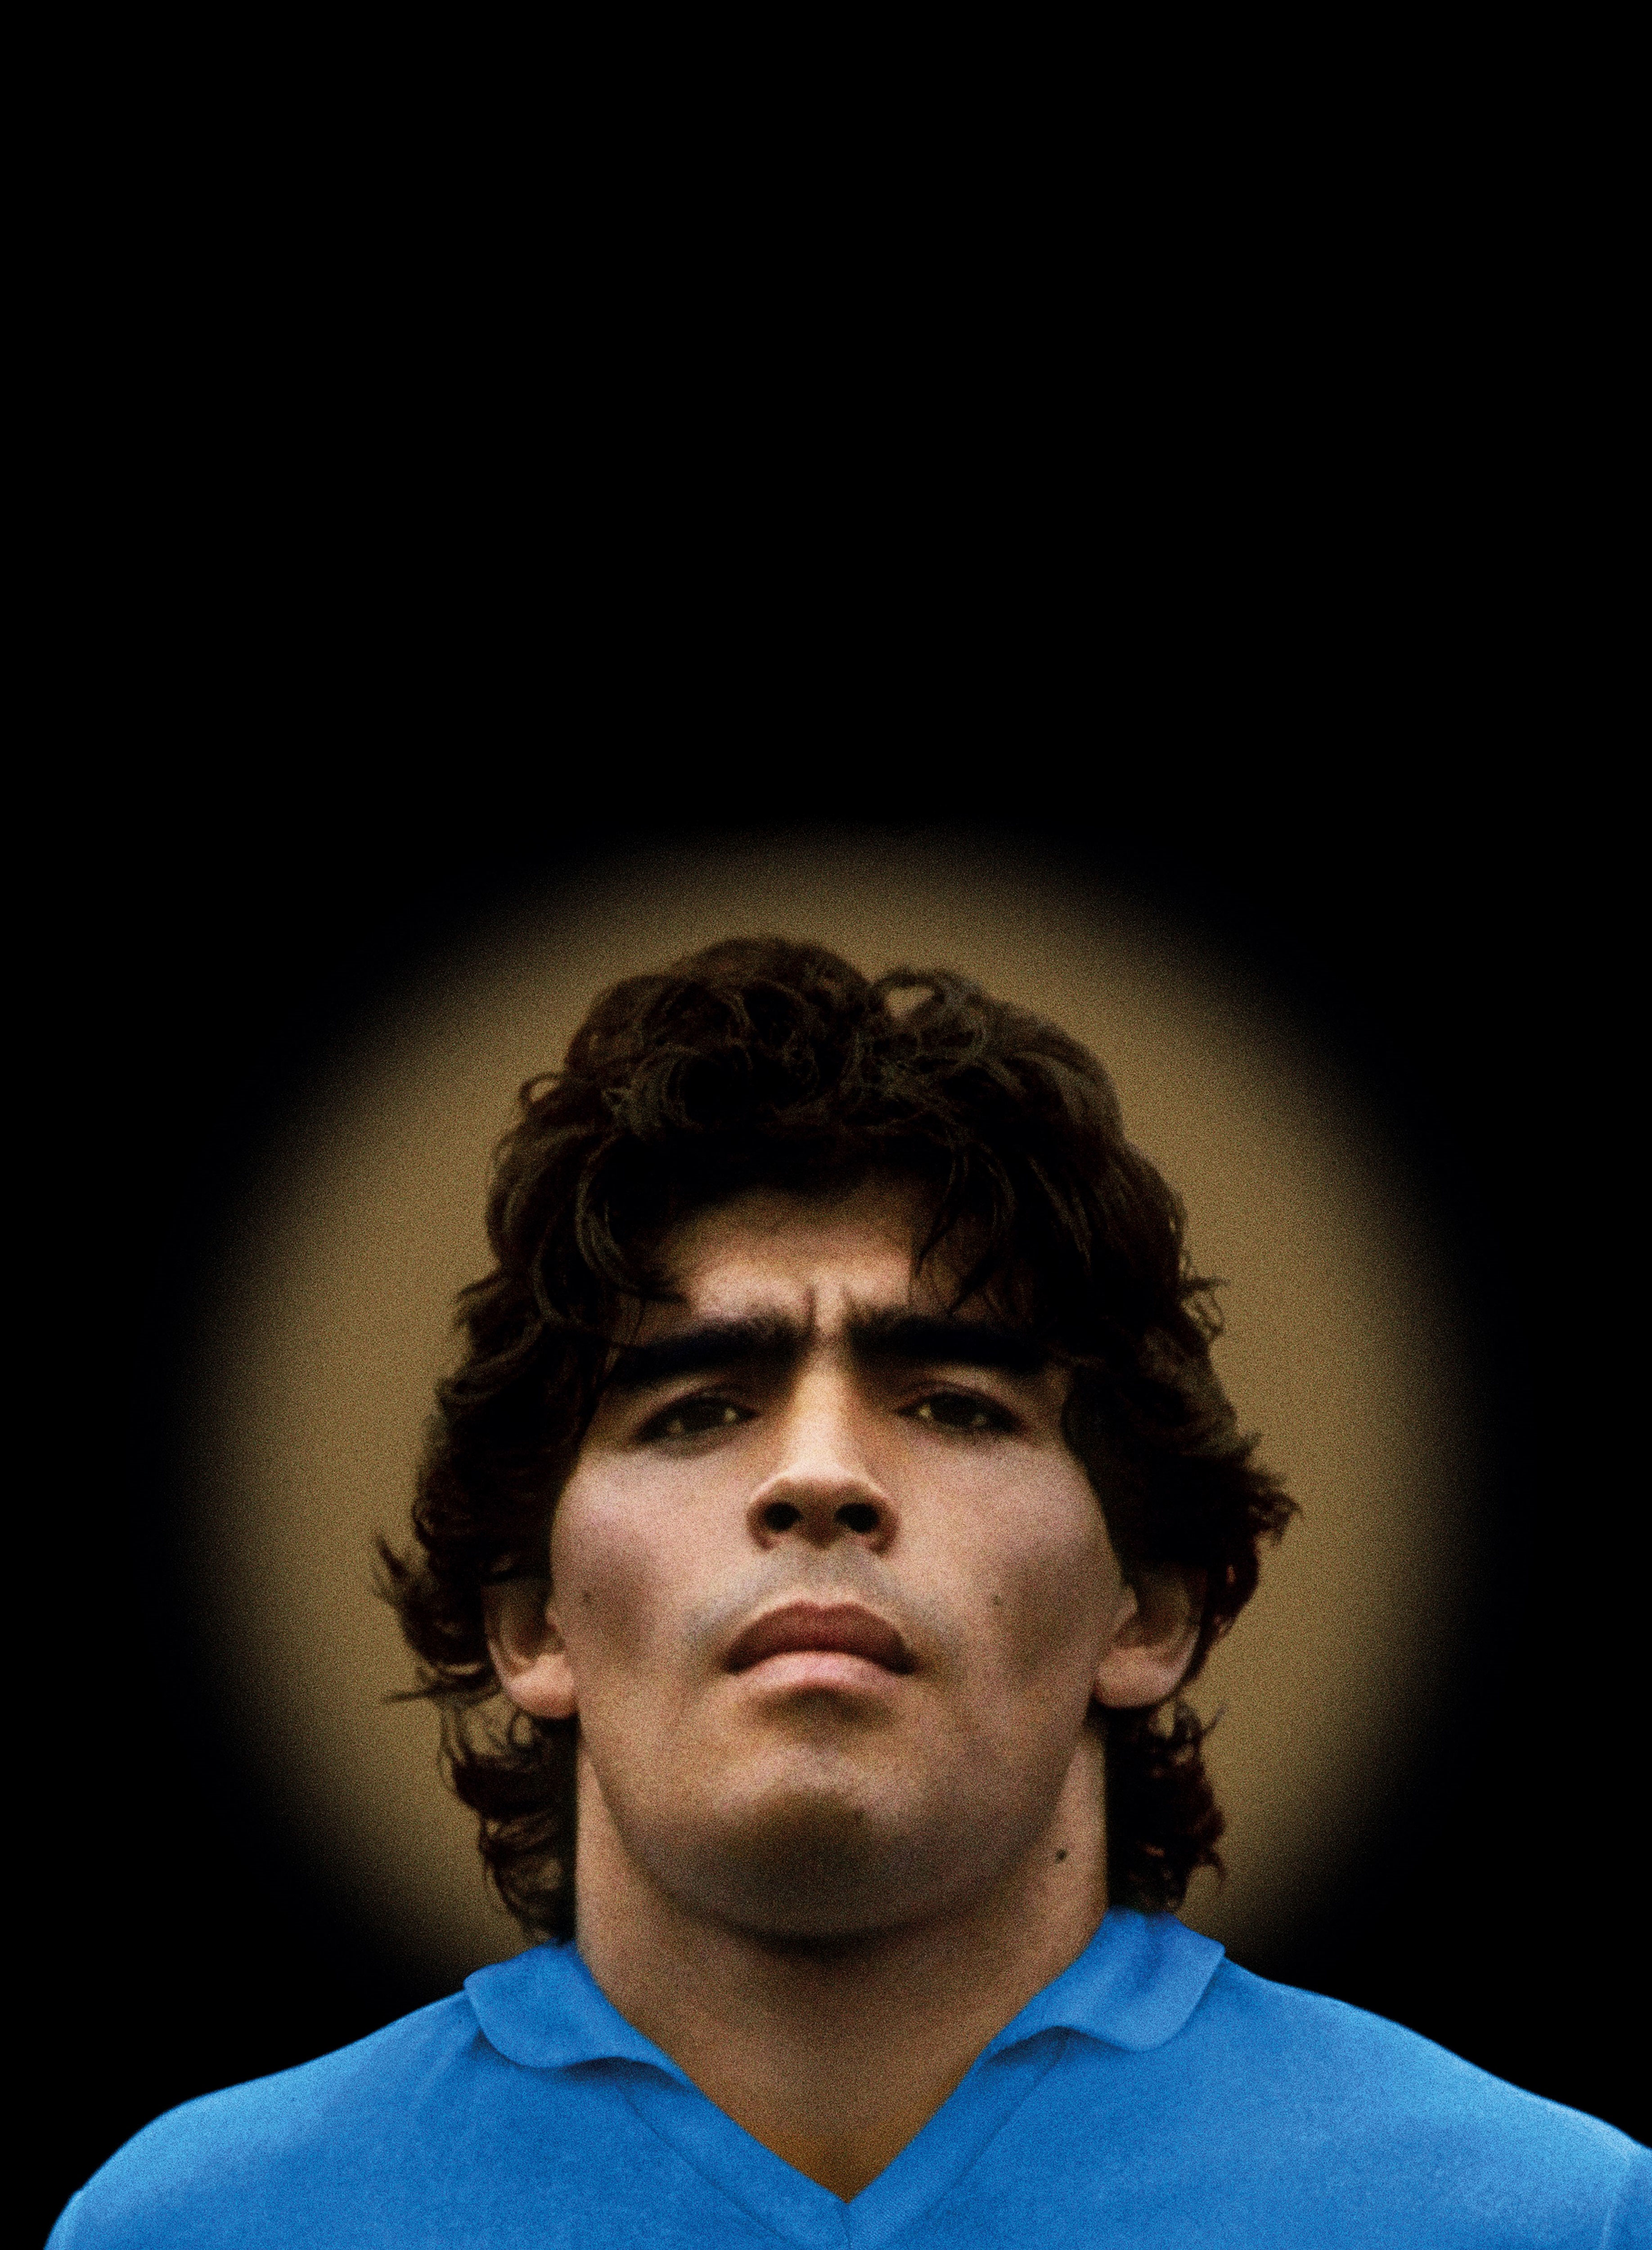 Maradona Wallpaper Posted By Ryan Walker